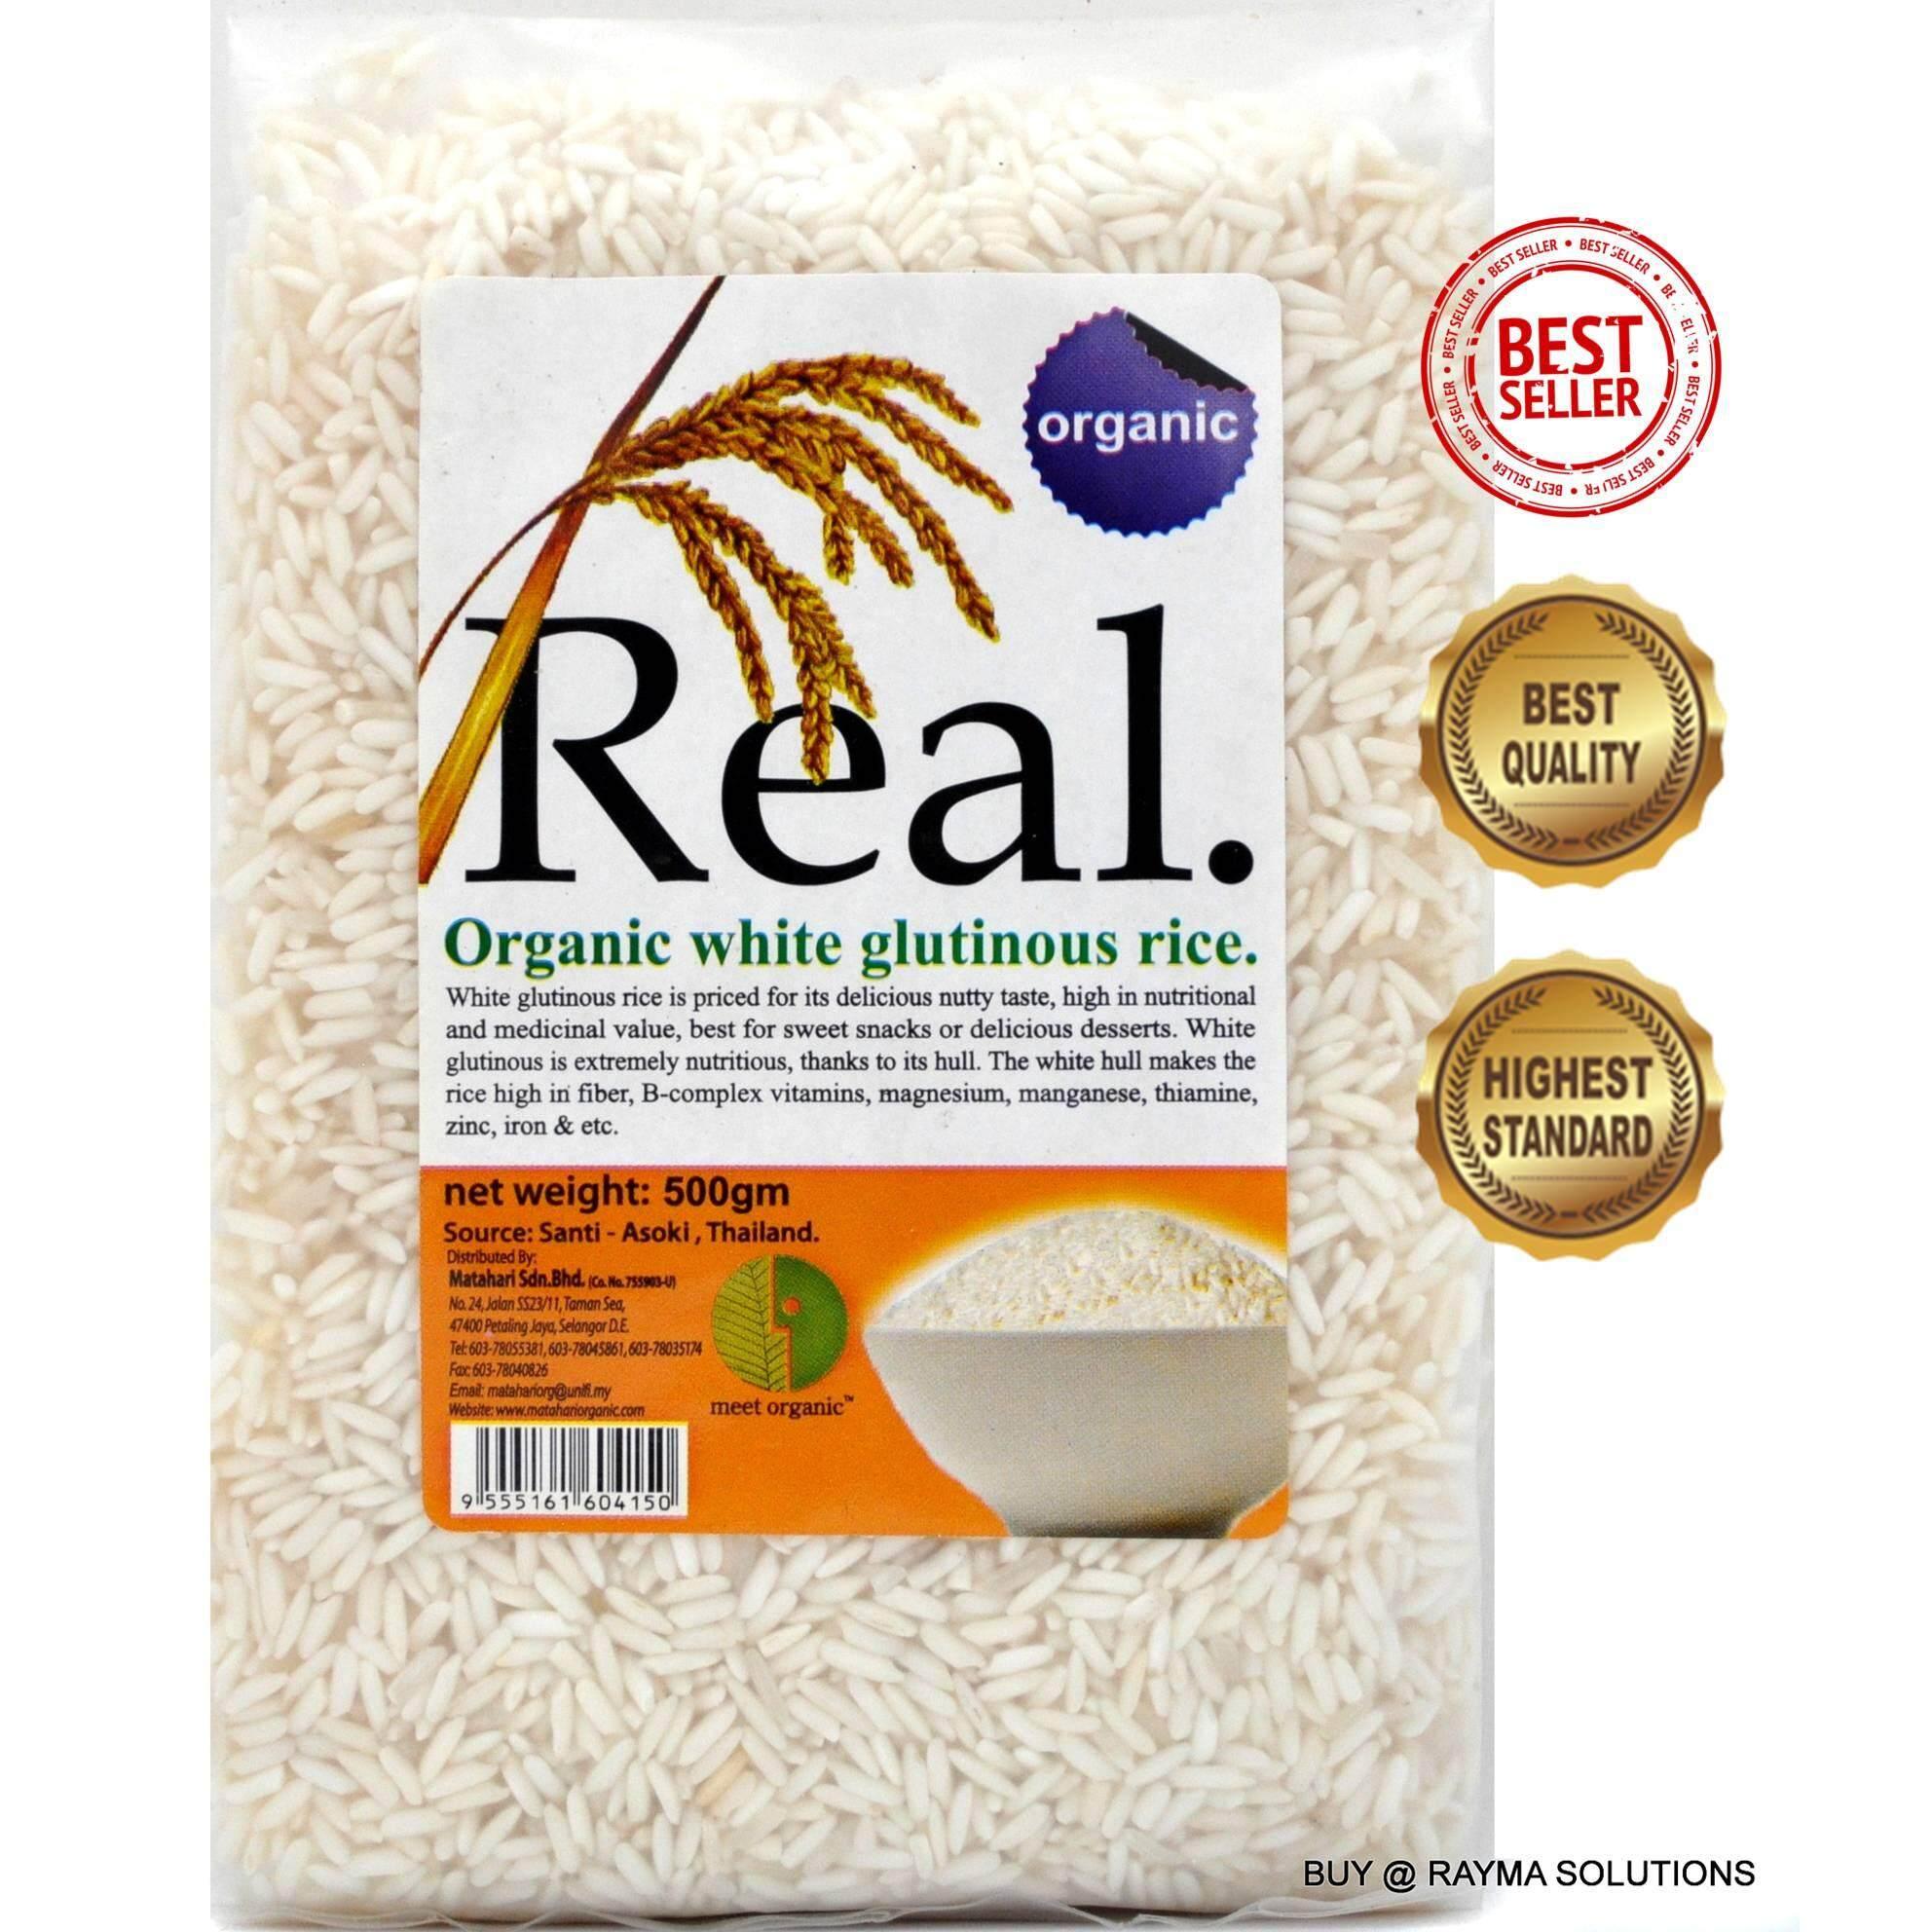 REAL Organic White Glutinous Rice 500g